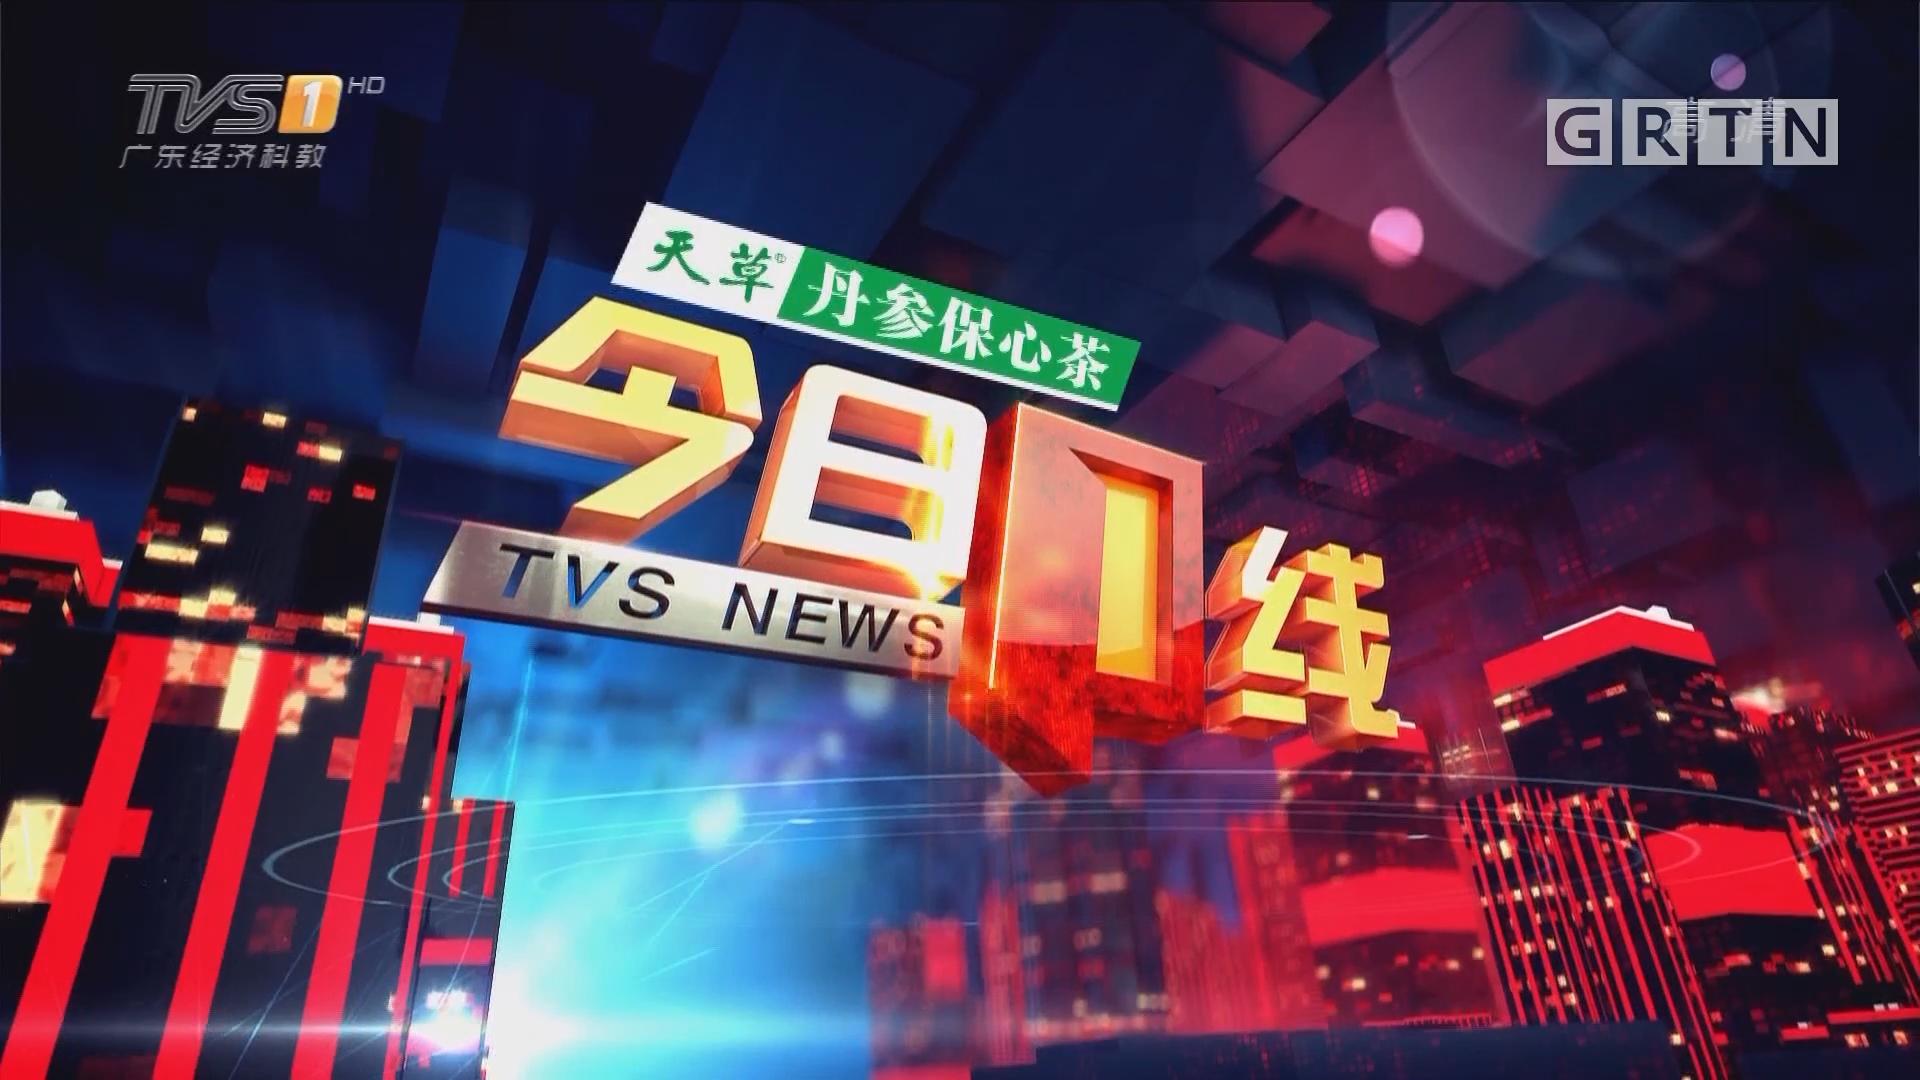 [HD][2018-12-03]今日一线:深圳:一男子公车上挥刀行凶 众人合力制服